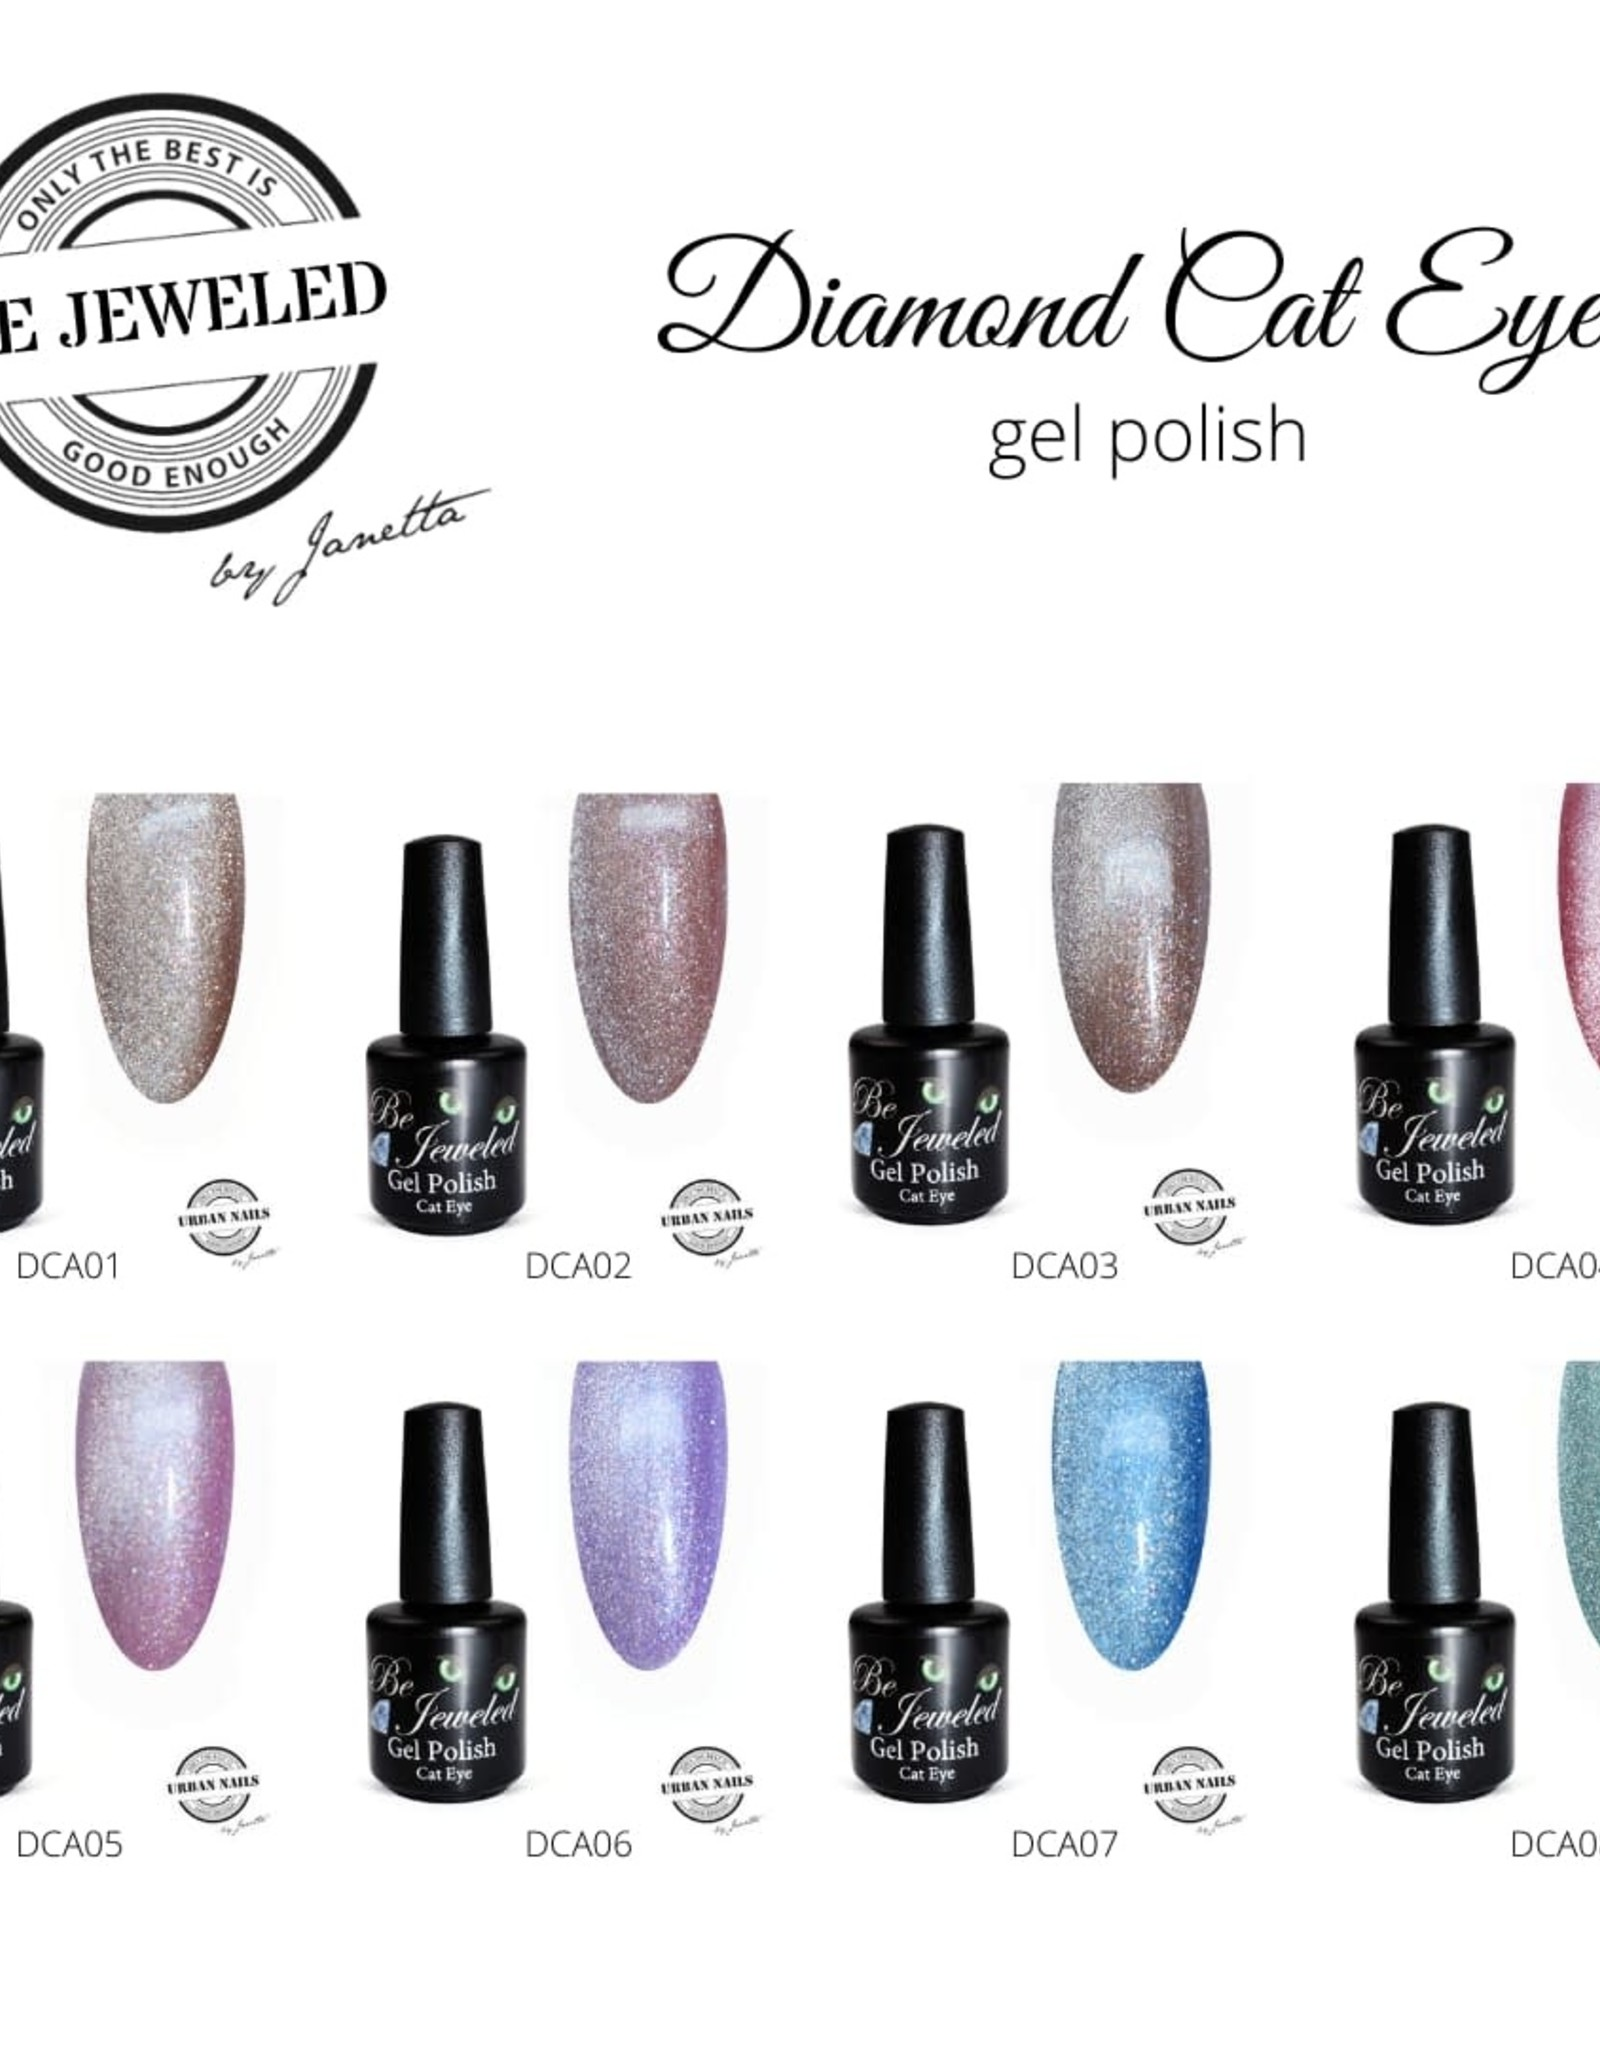 Urban Nails Be Jeweled Cateye Diamond 05